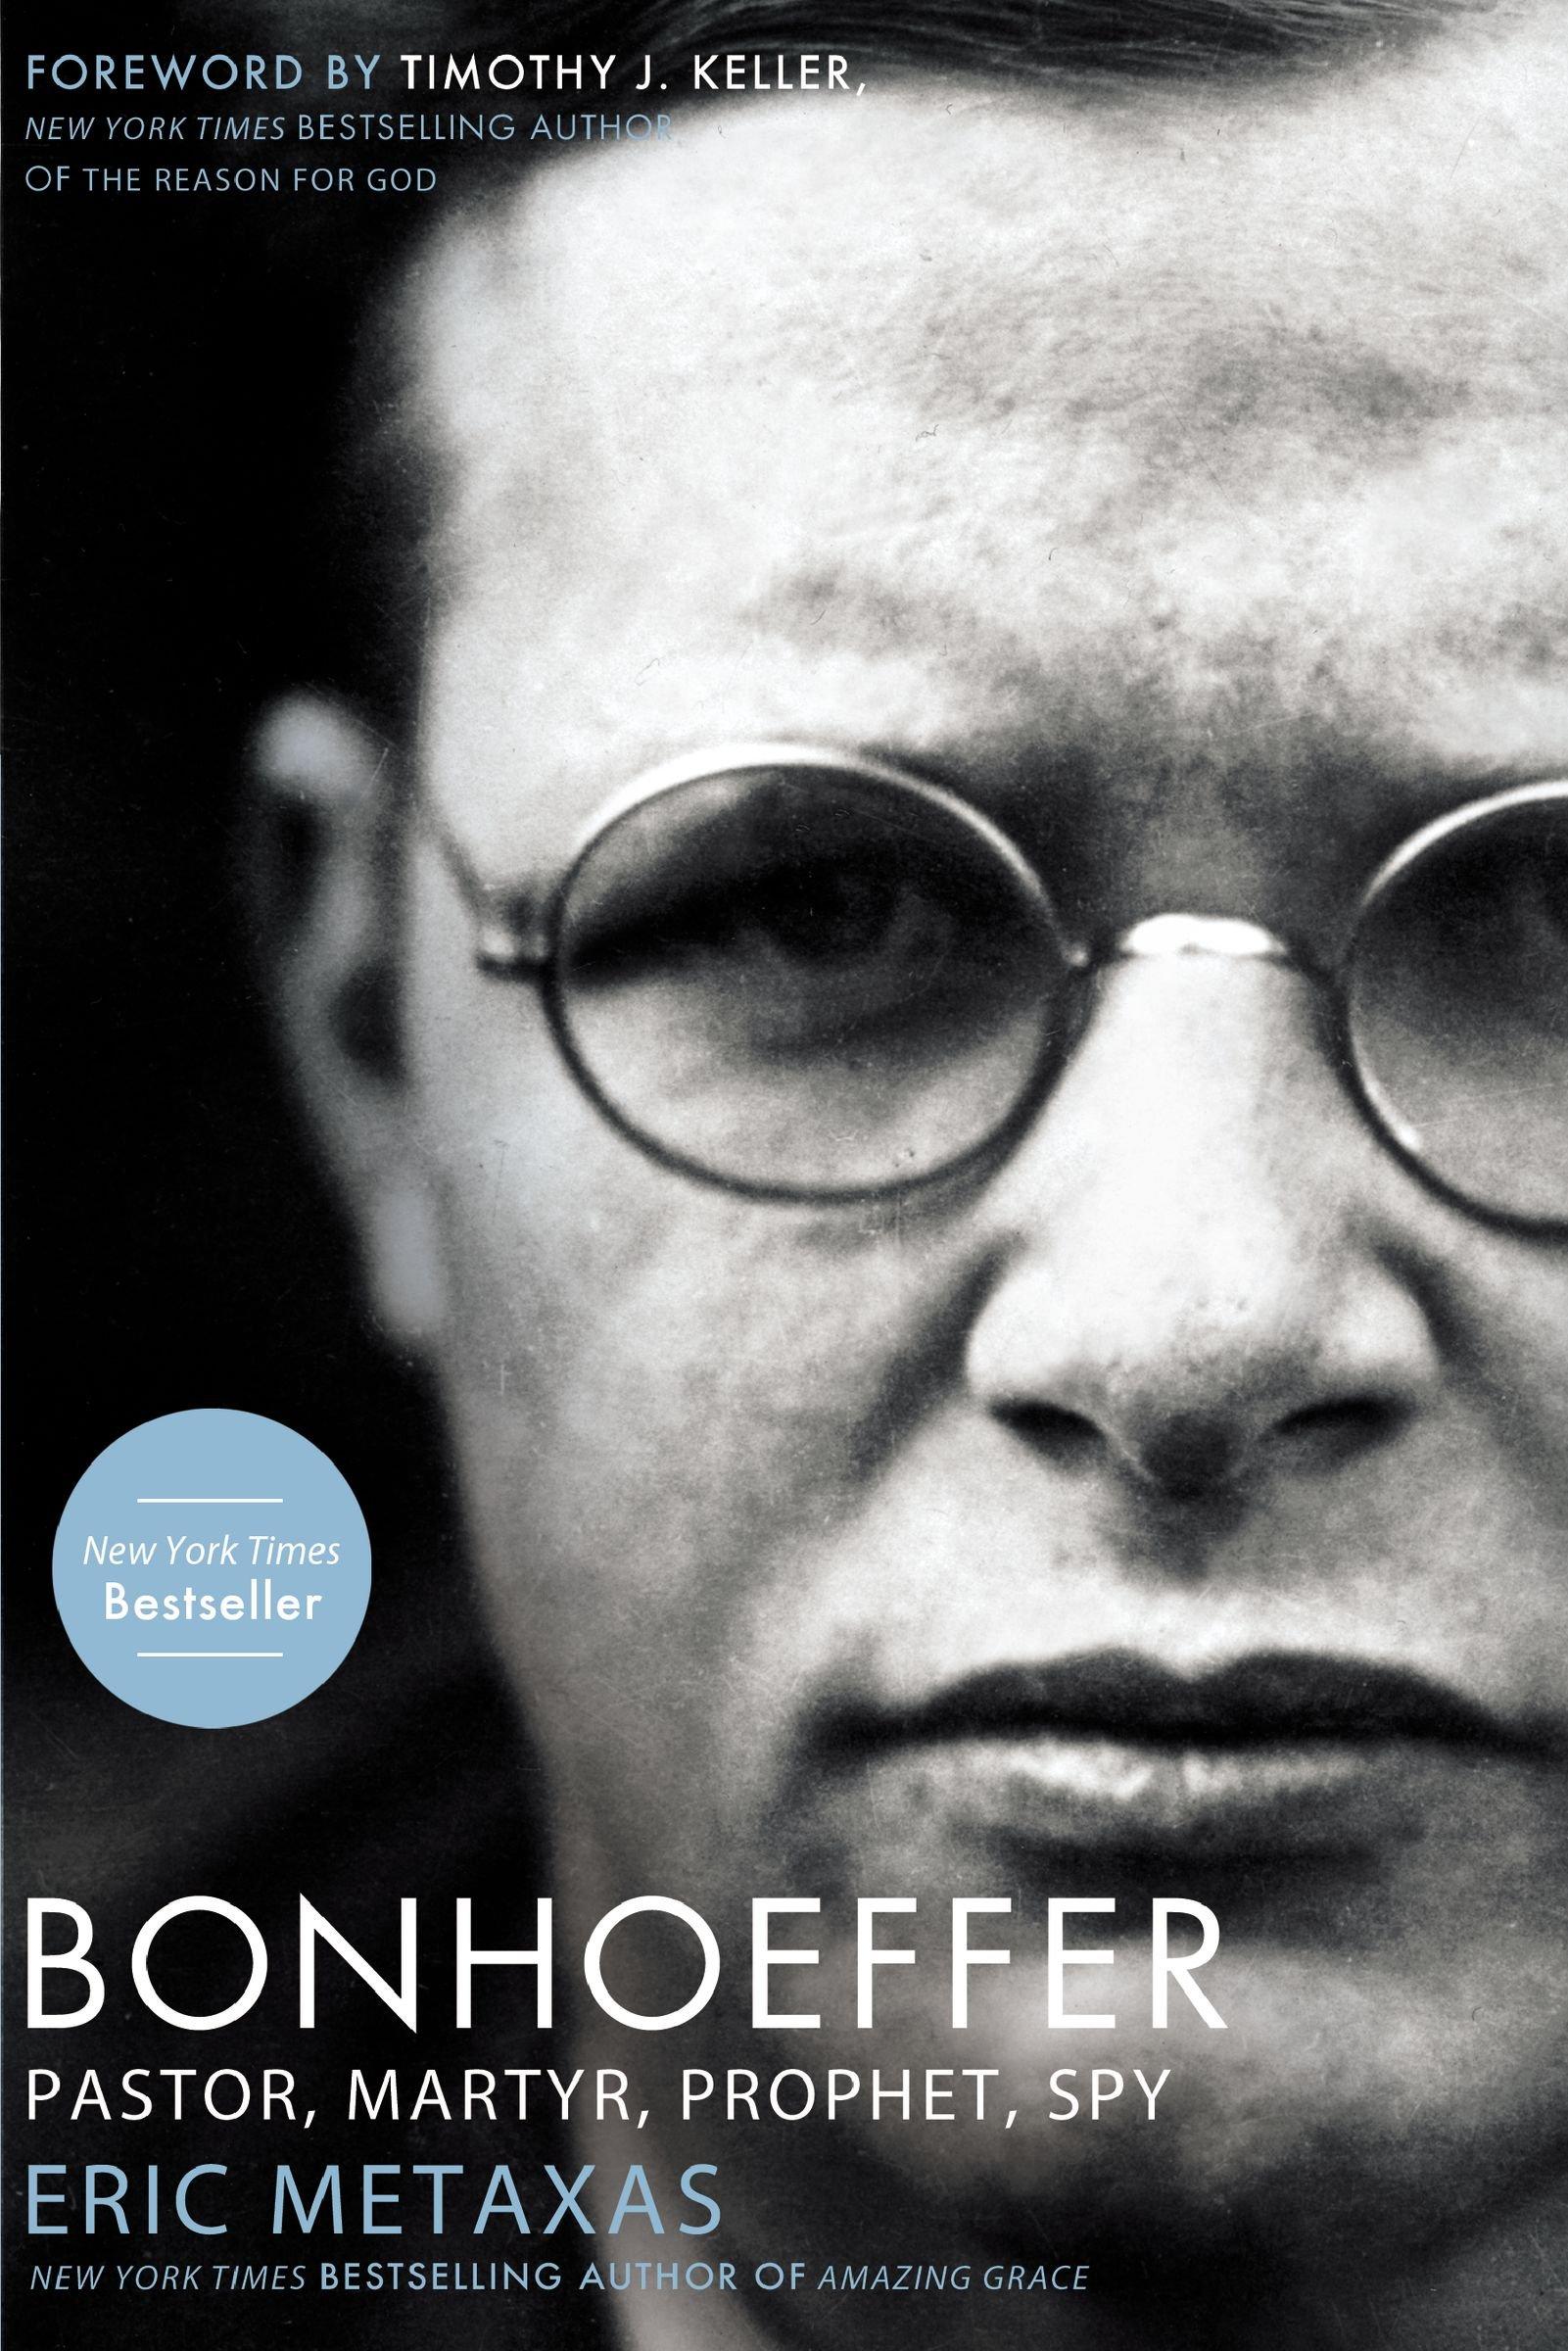 Bonhoeffer: Pastor, Martyr, Prophet, Spy: Amazon.es: Eric Metaxas: Libros en idiomas extranjeros